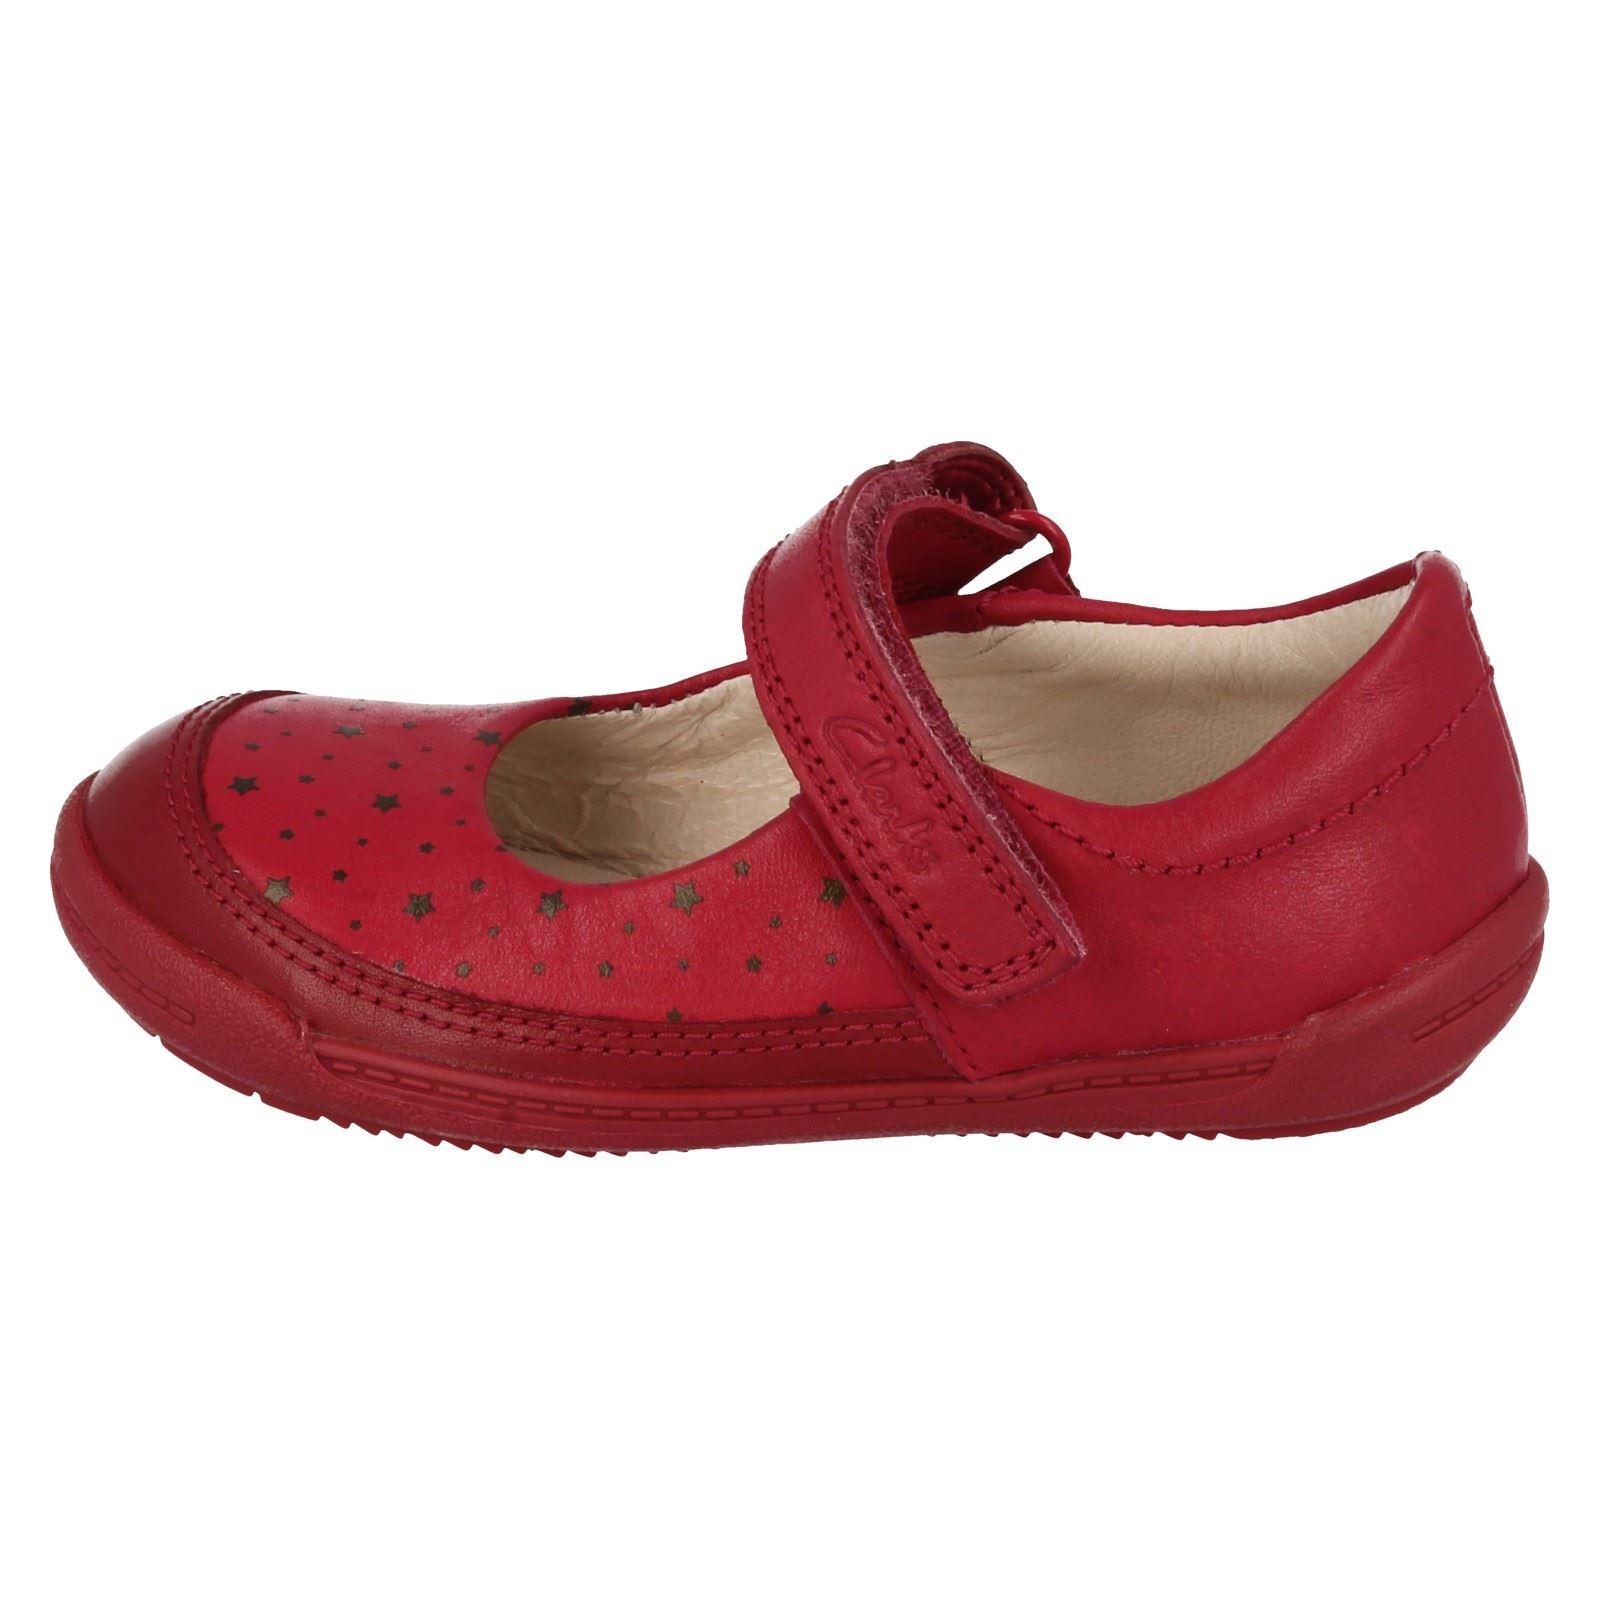 Infant Girls Clarks Riptape Flexible Soft Leather First Walking Shoes Softly Ida